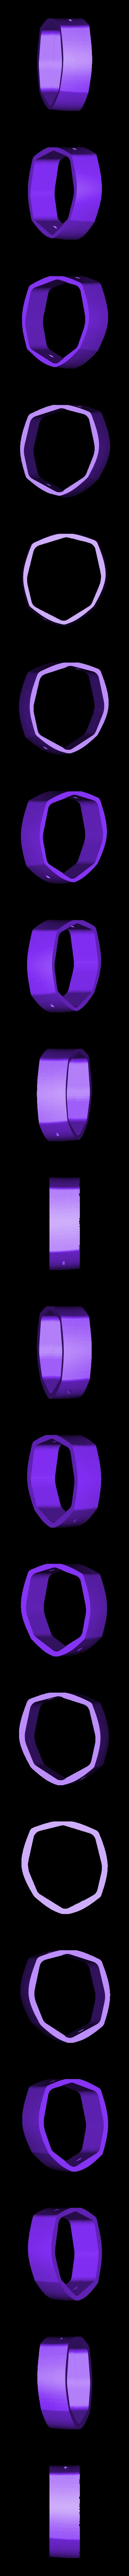 Banane_3D_2_jonction.STL Download free STL file Lulu's Banana box • 3D printing model, lulu3Dbuilder